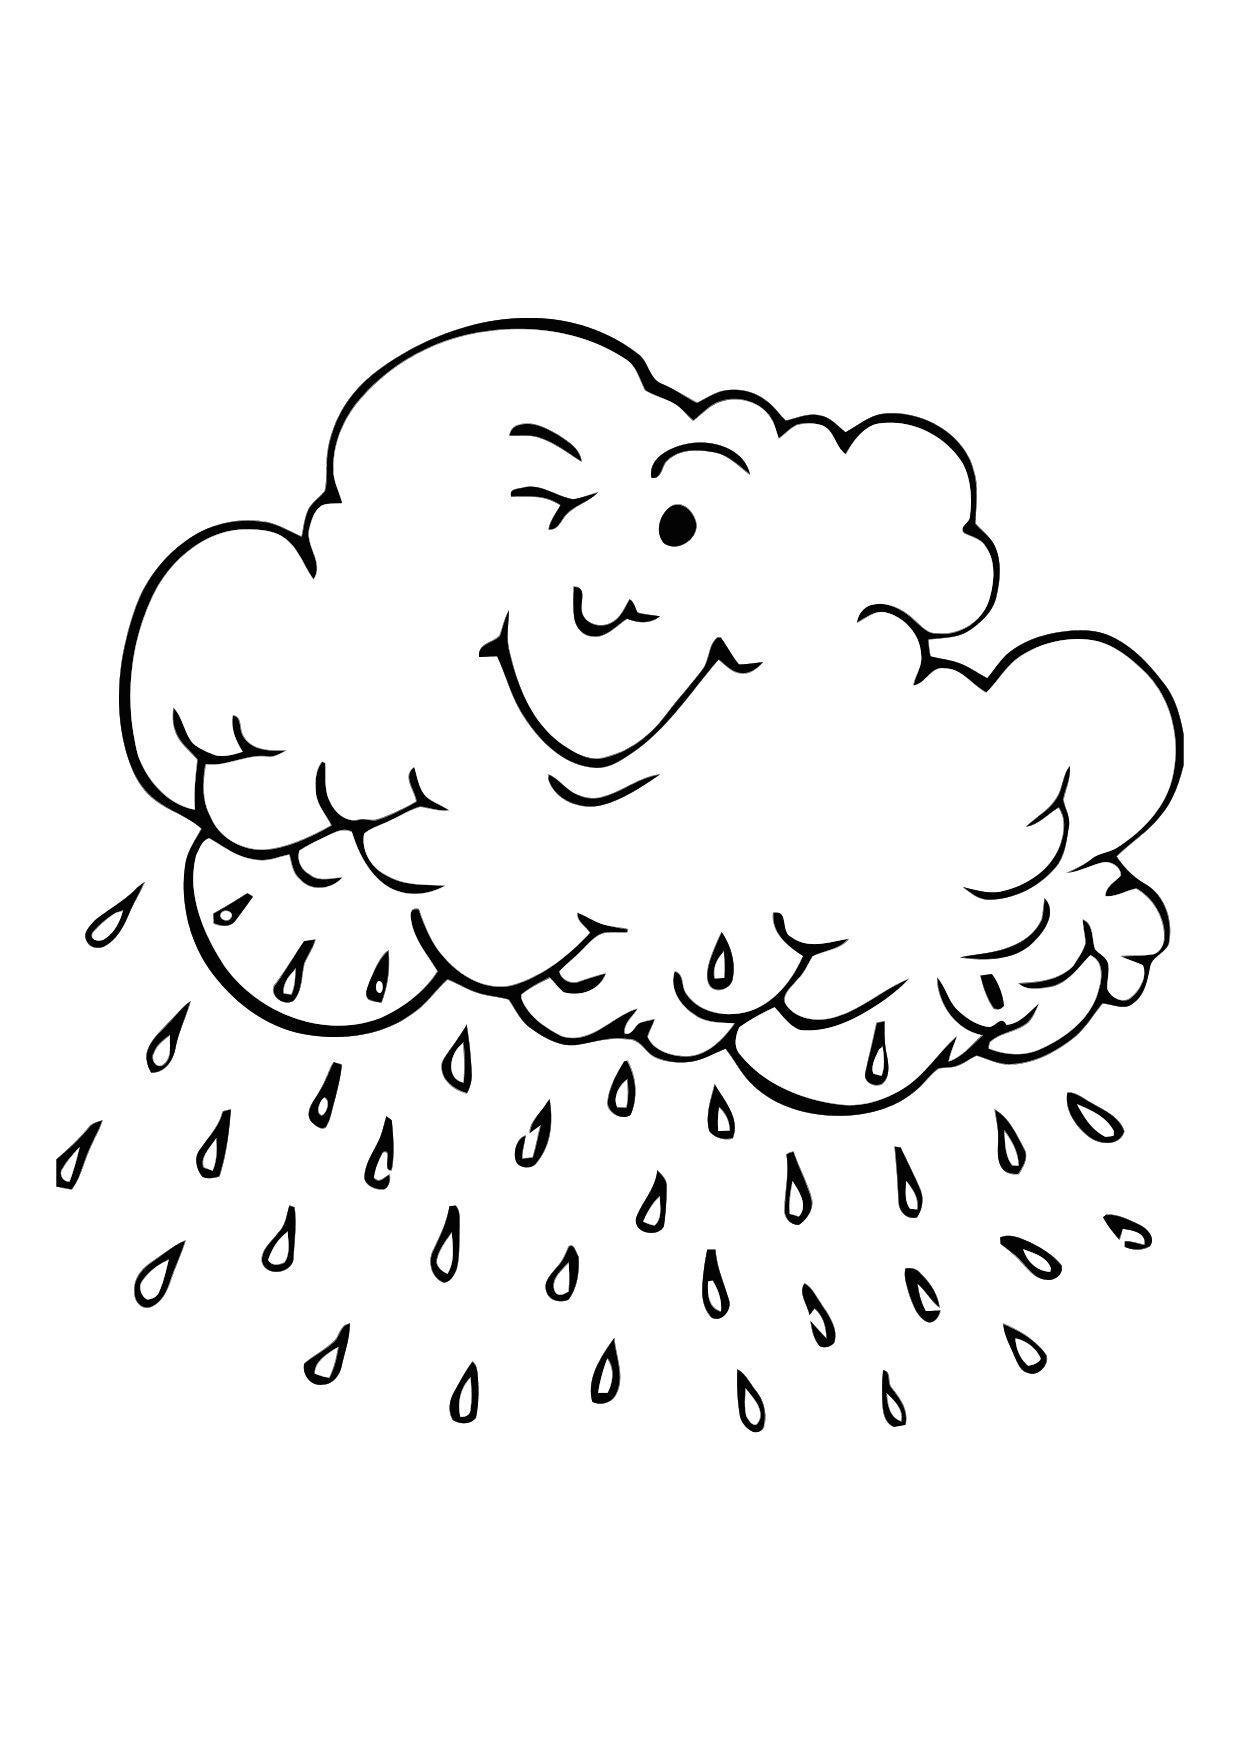 Fein Malvorlagen Regenschirm Regen Bilder - Entry Level Resume ...